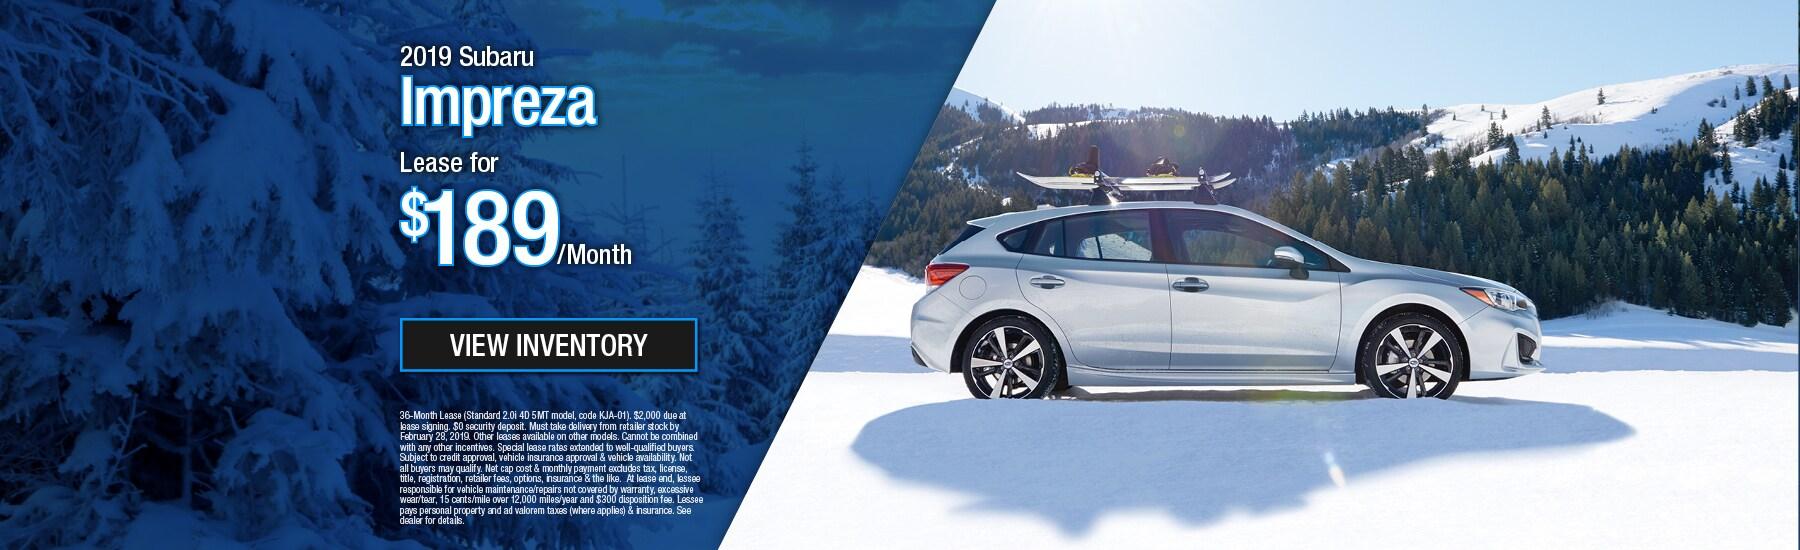 Car Dealerships Vancouver Wa >> Dick Hannah Subaru: Subaru Dealership In Vancouver Serving Washington